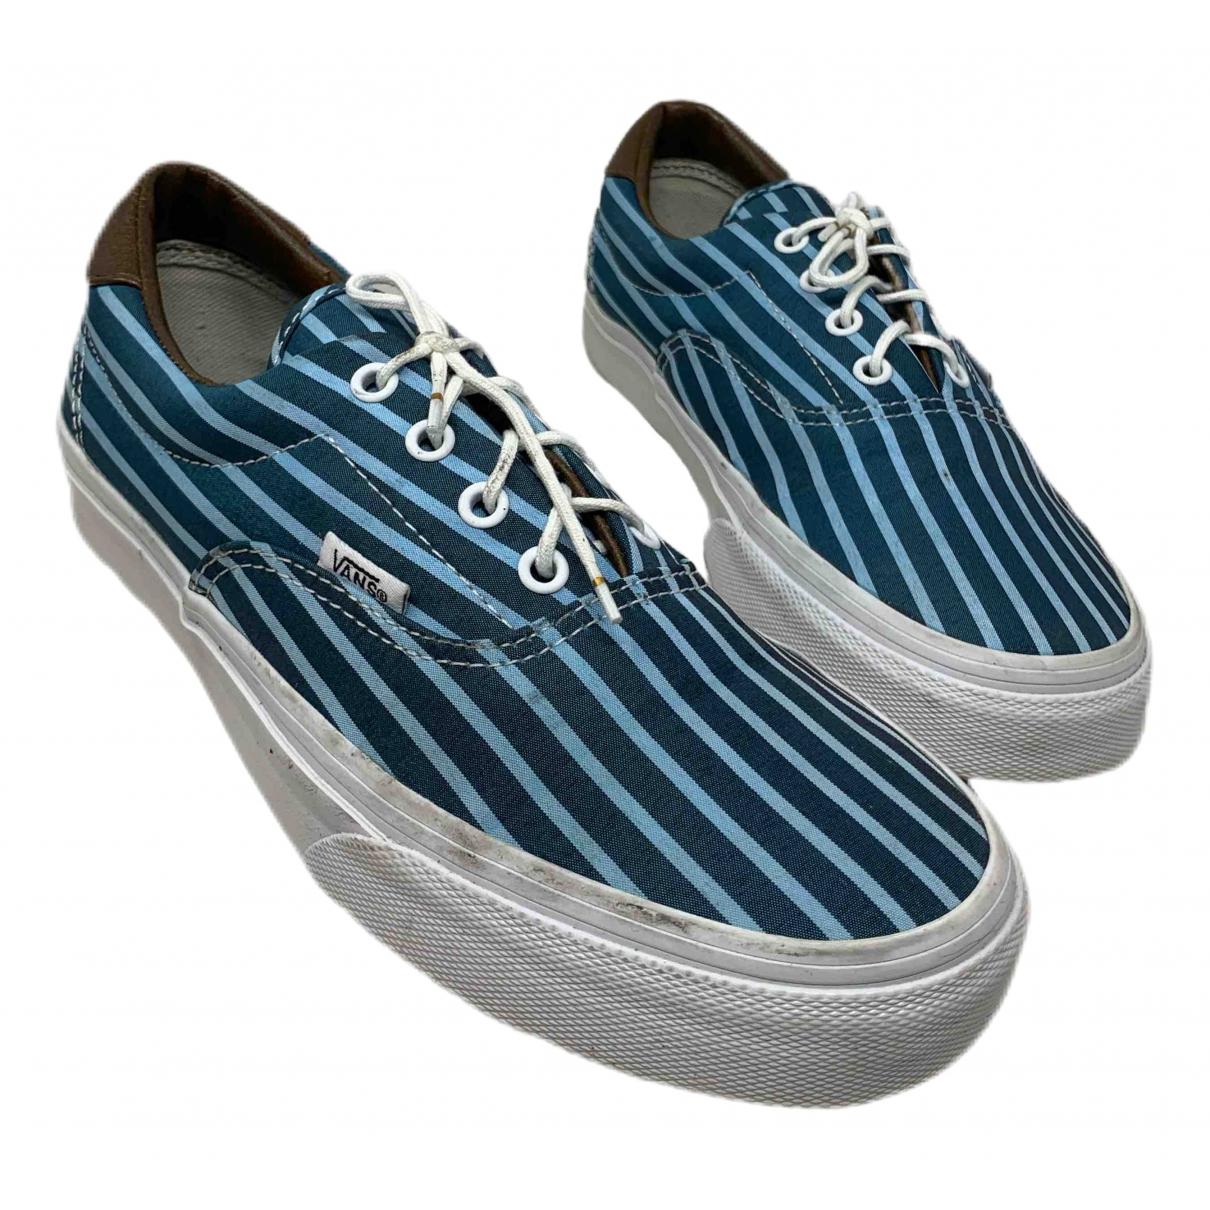 Vans N Blue Cloth Trainers for Men 6 US